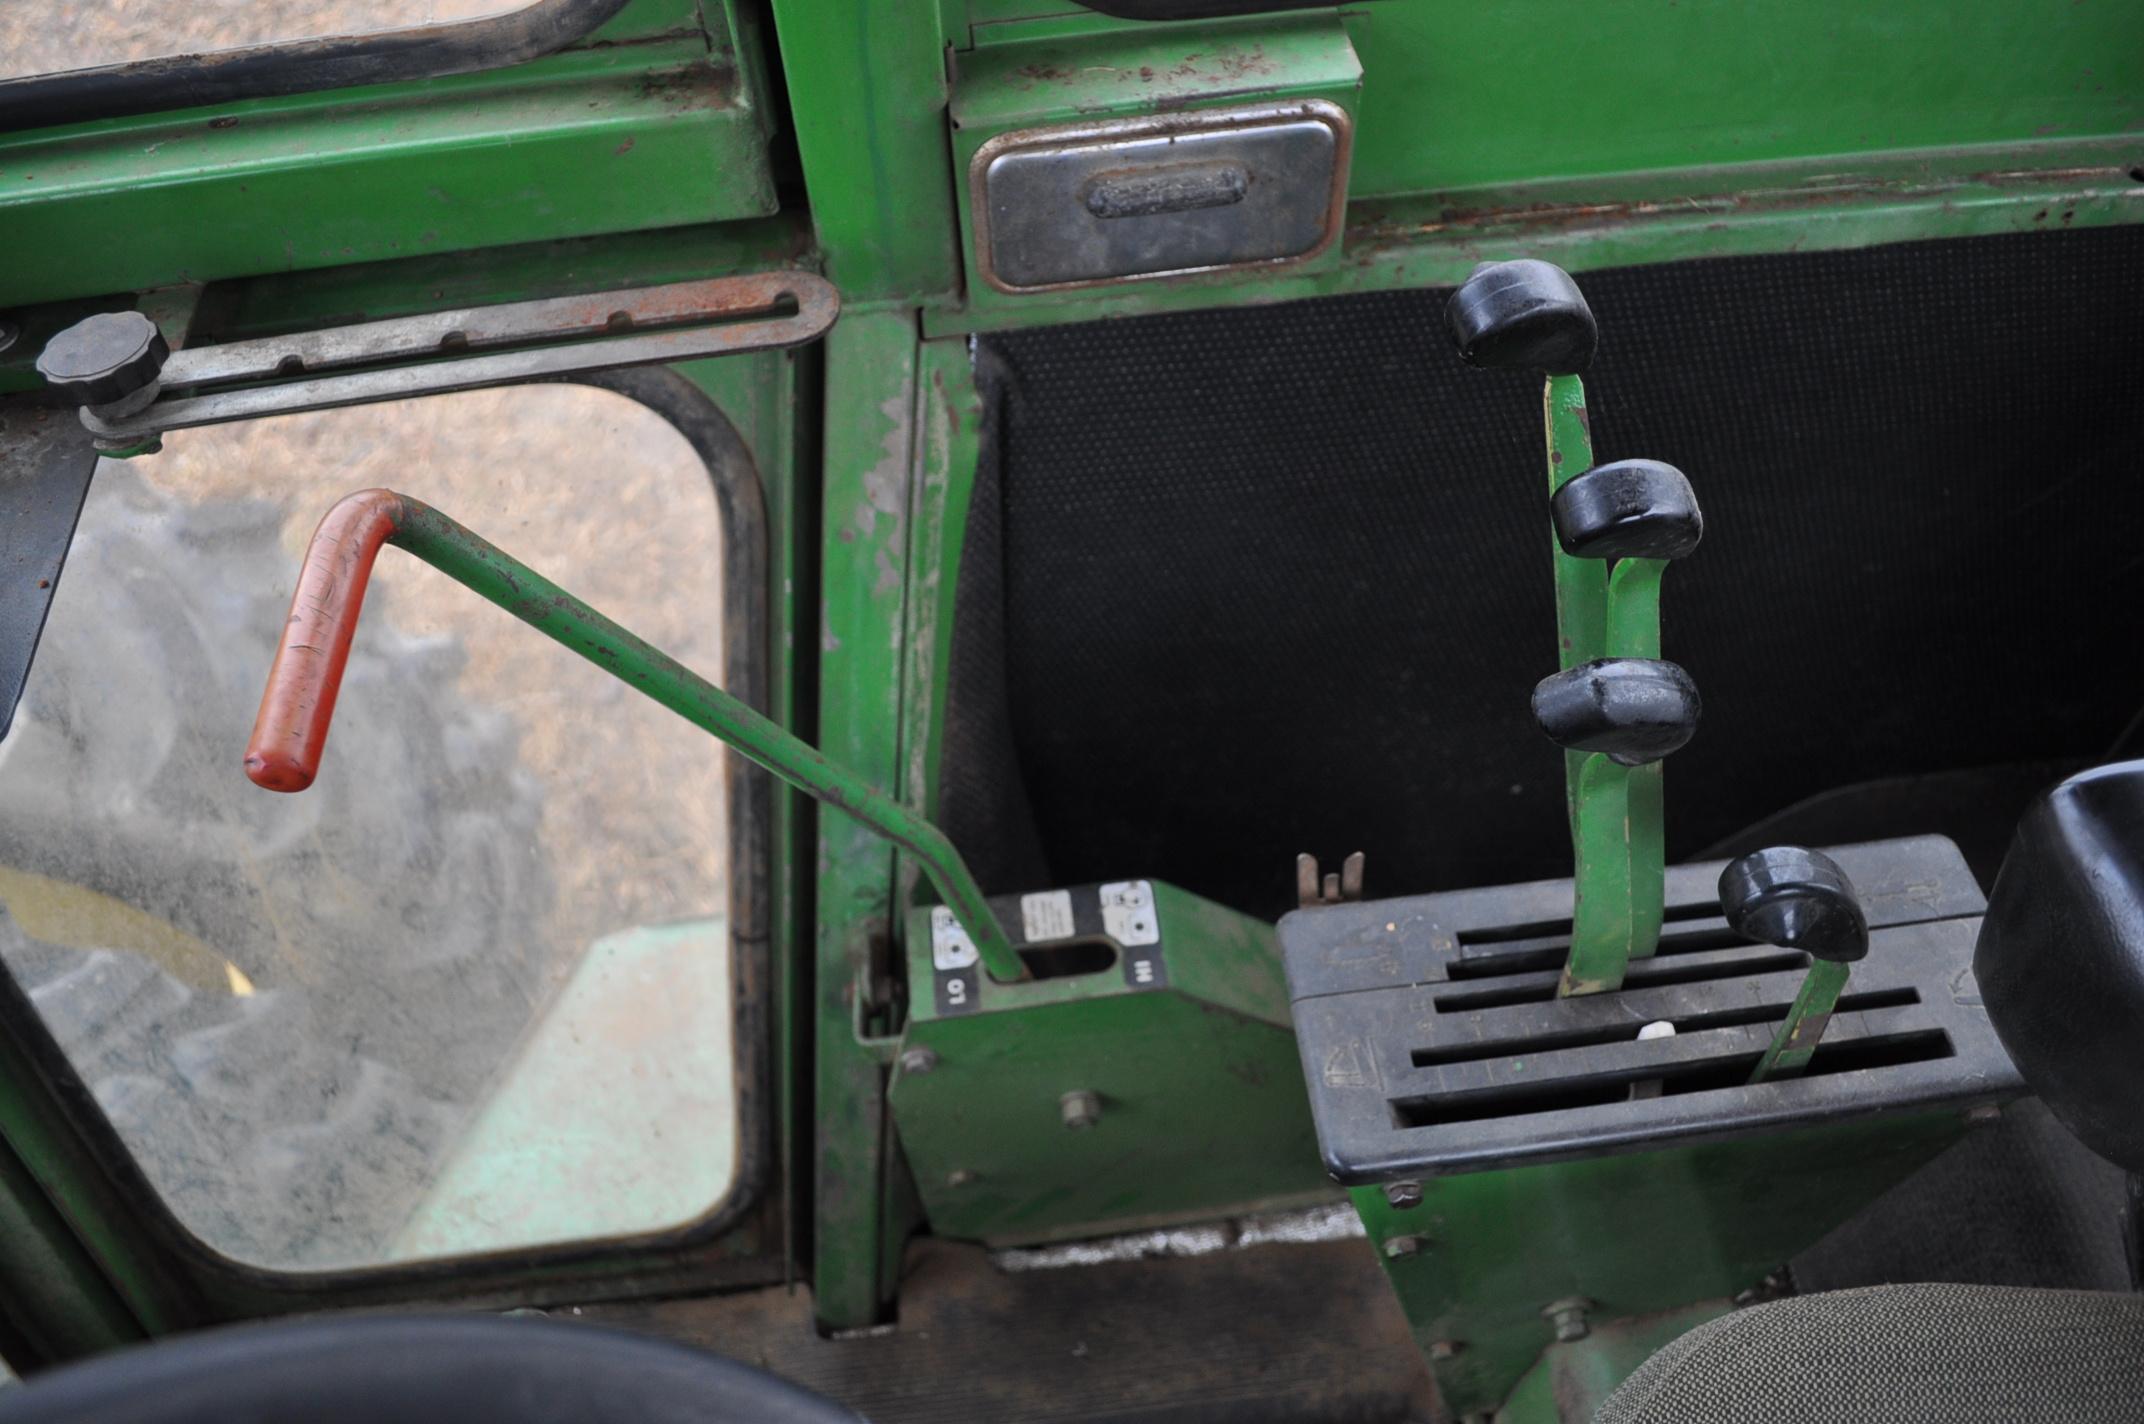 John Deere 7520 tractor, 4WD, diesel, 18.4-34 duals, original fenders, CHA, cab interior kit, 3 - Image 18 of 24